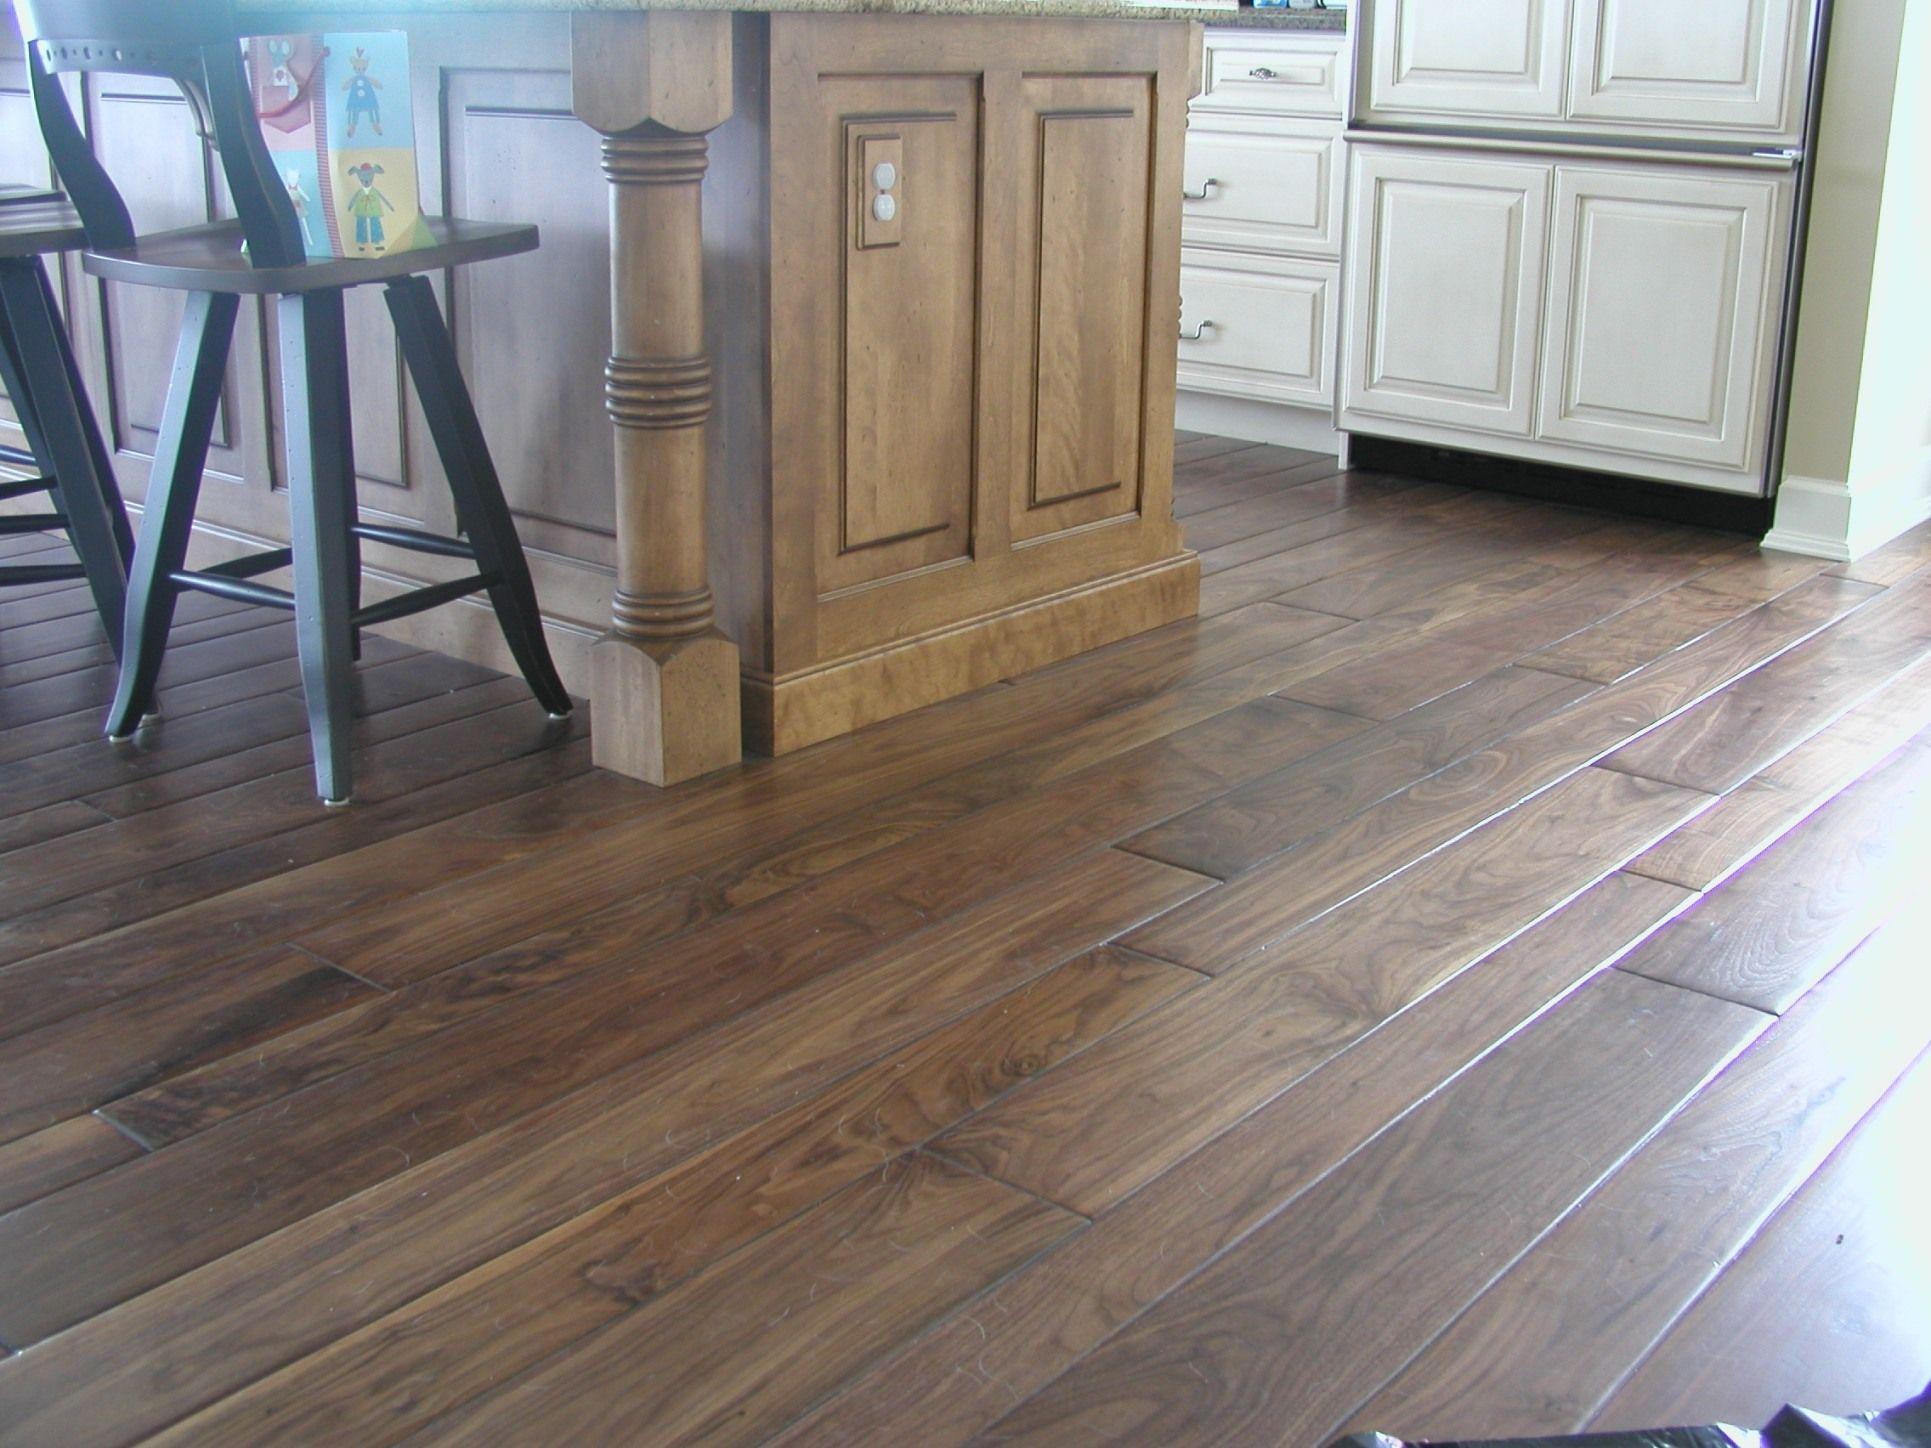 walnut bleached wood floor (With images) Wood floor